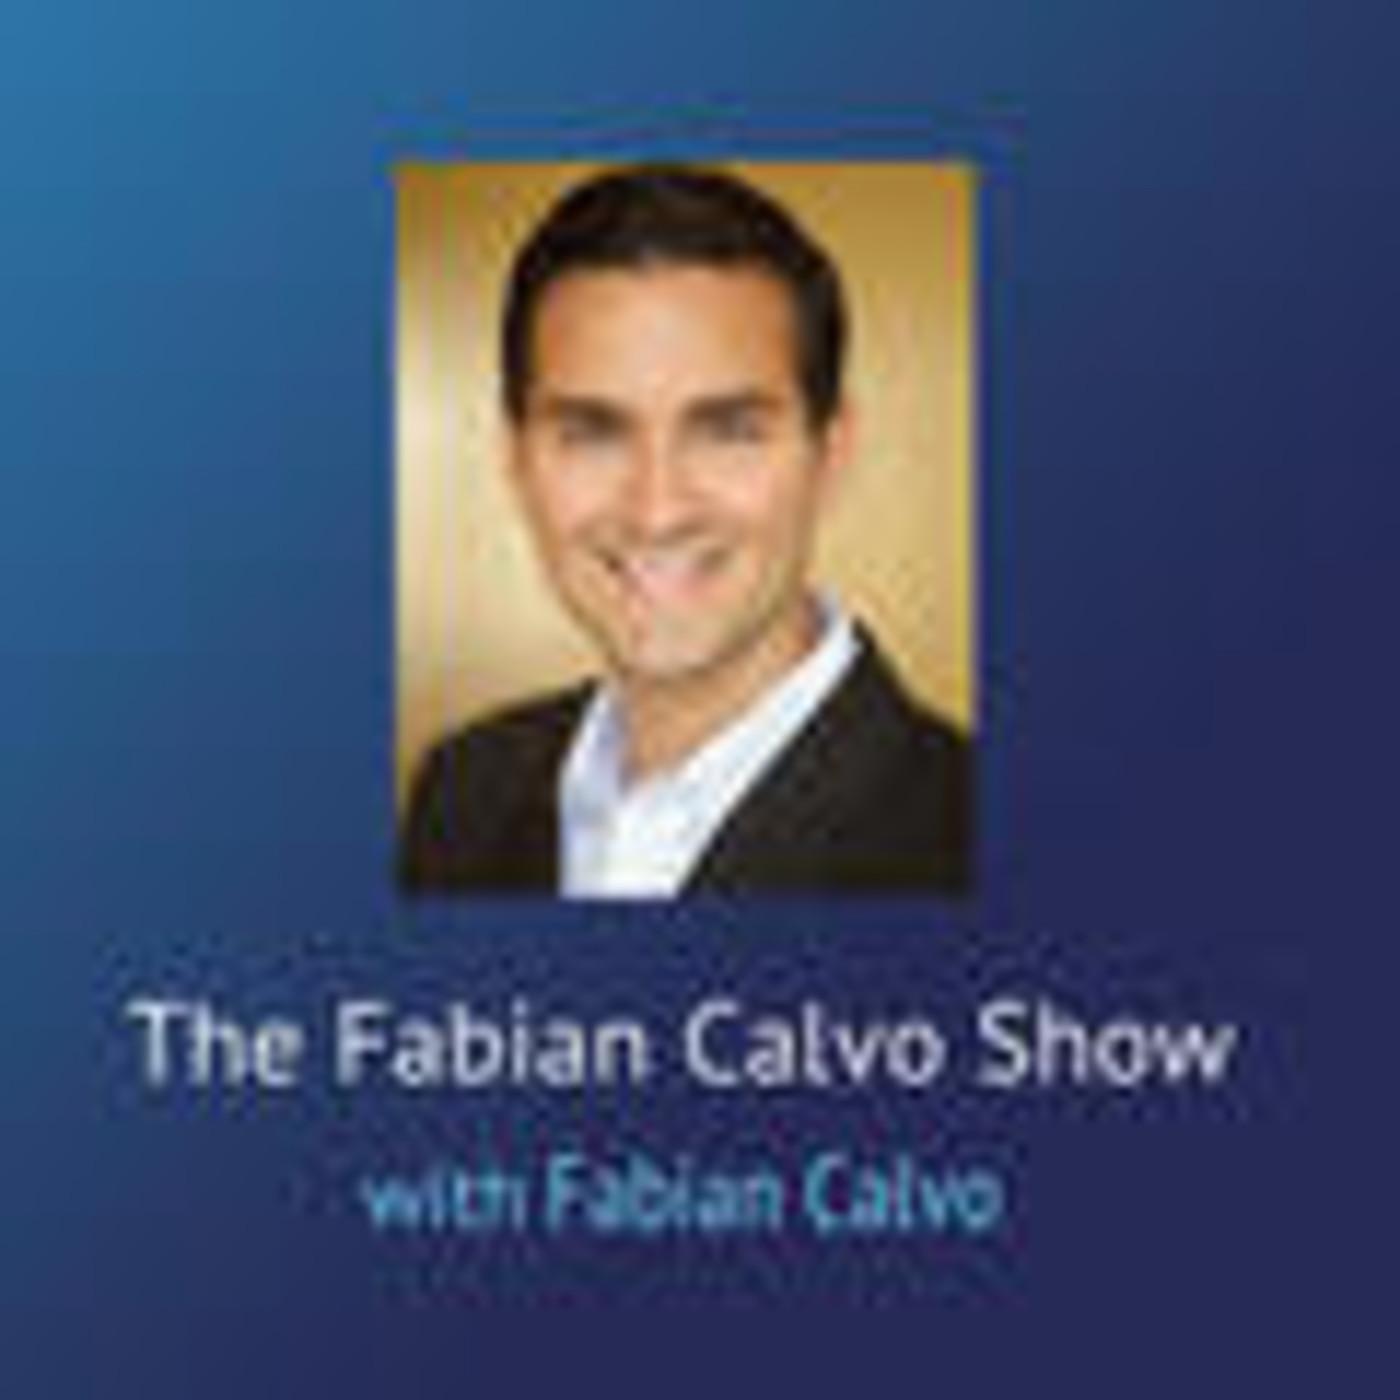 Fabian Calvo